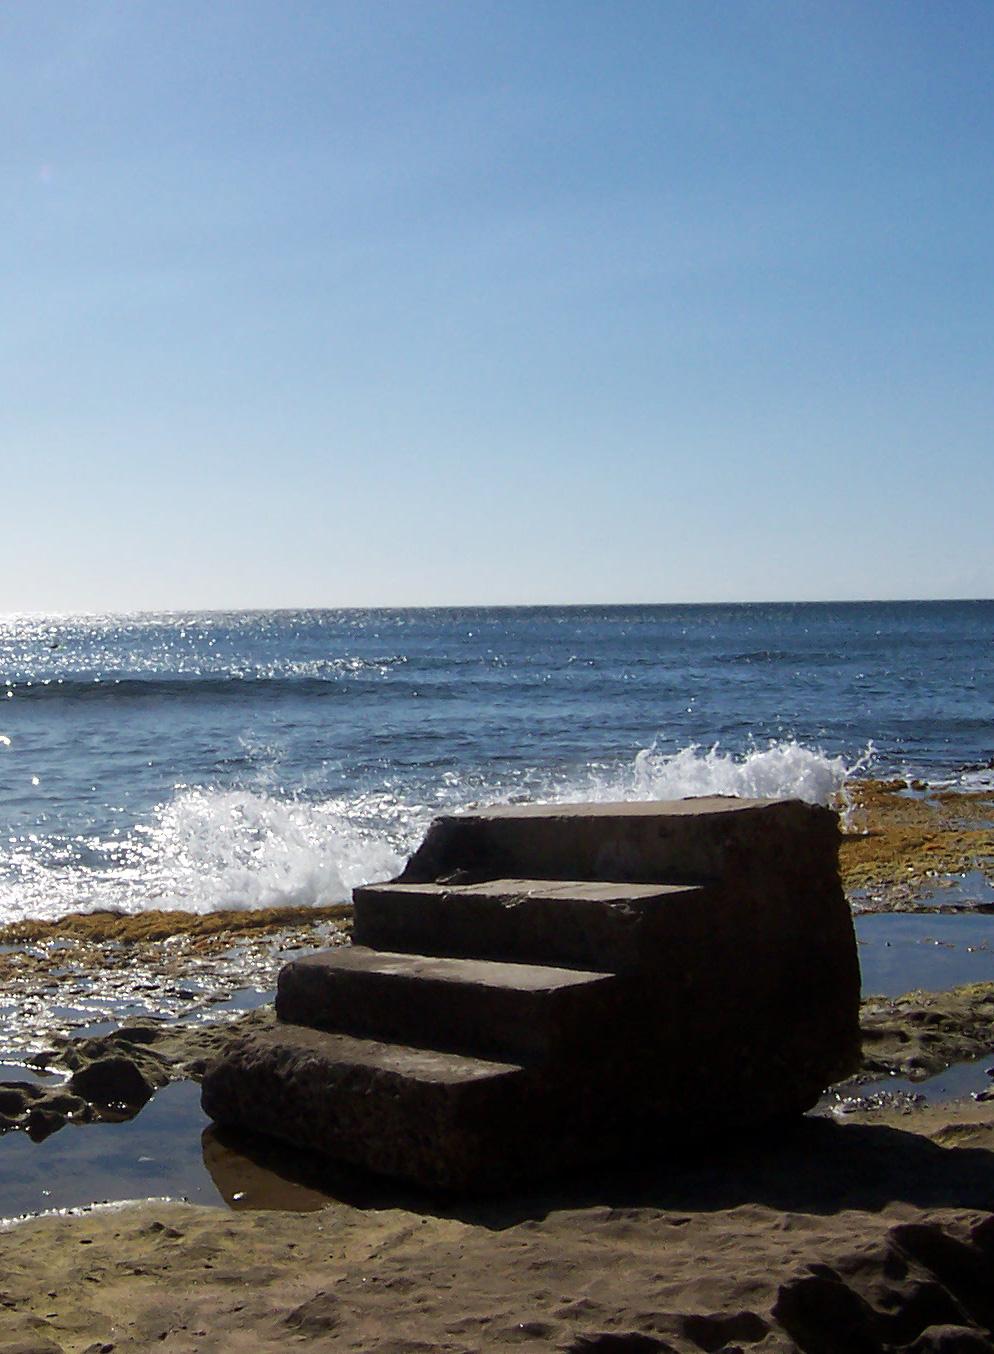 Playa Escalera